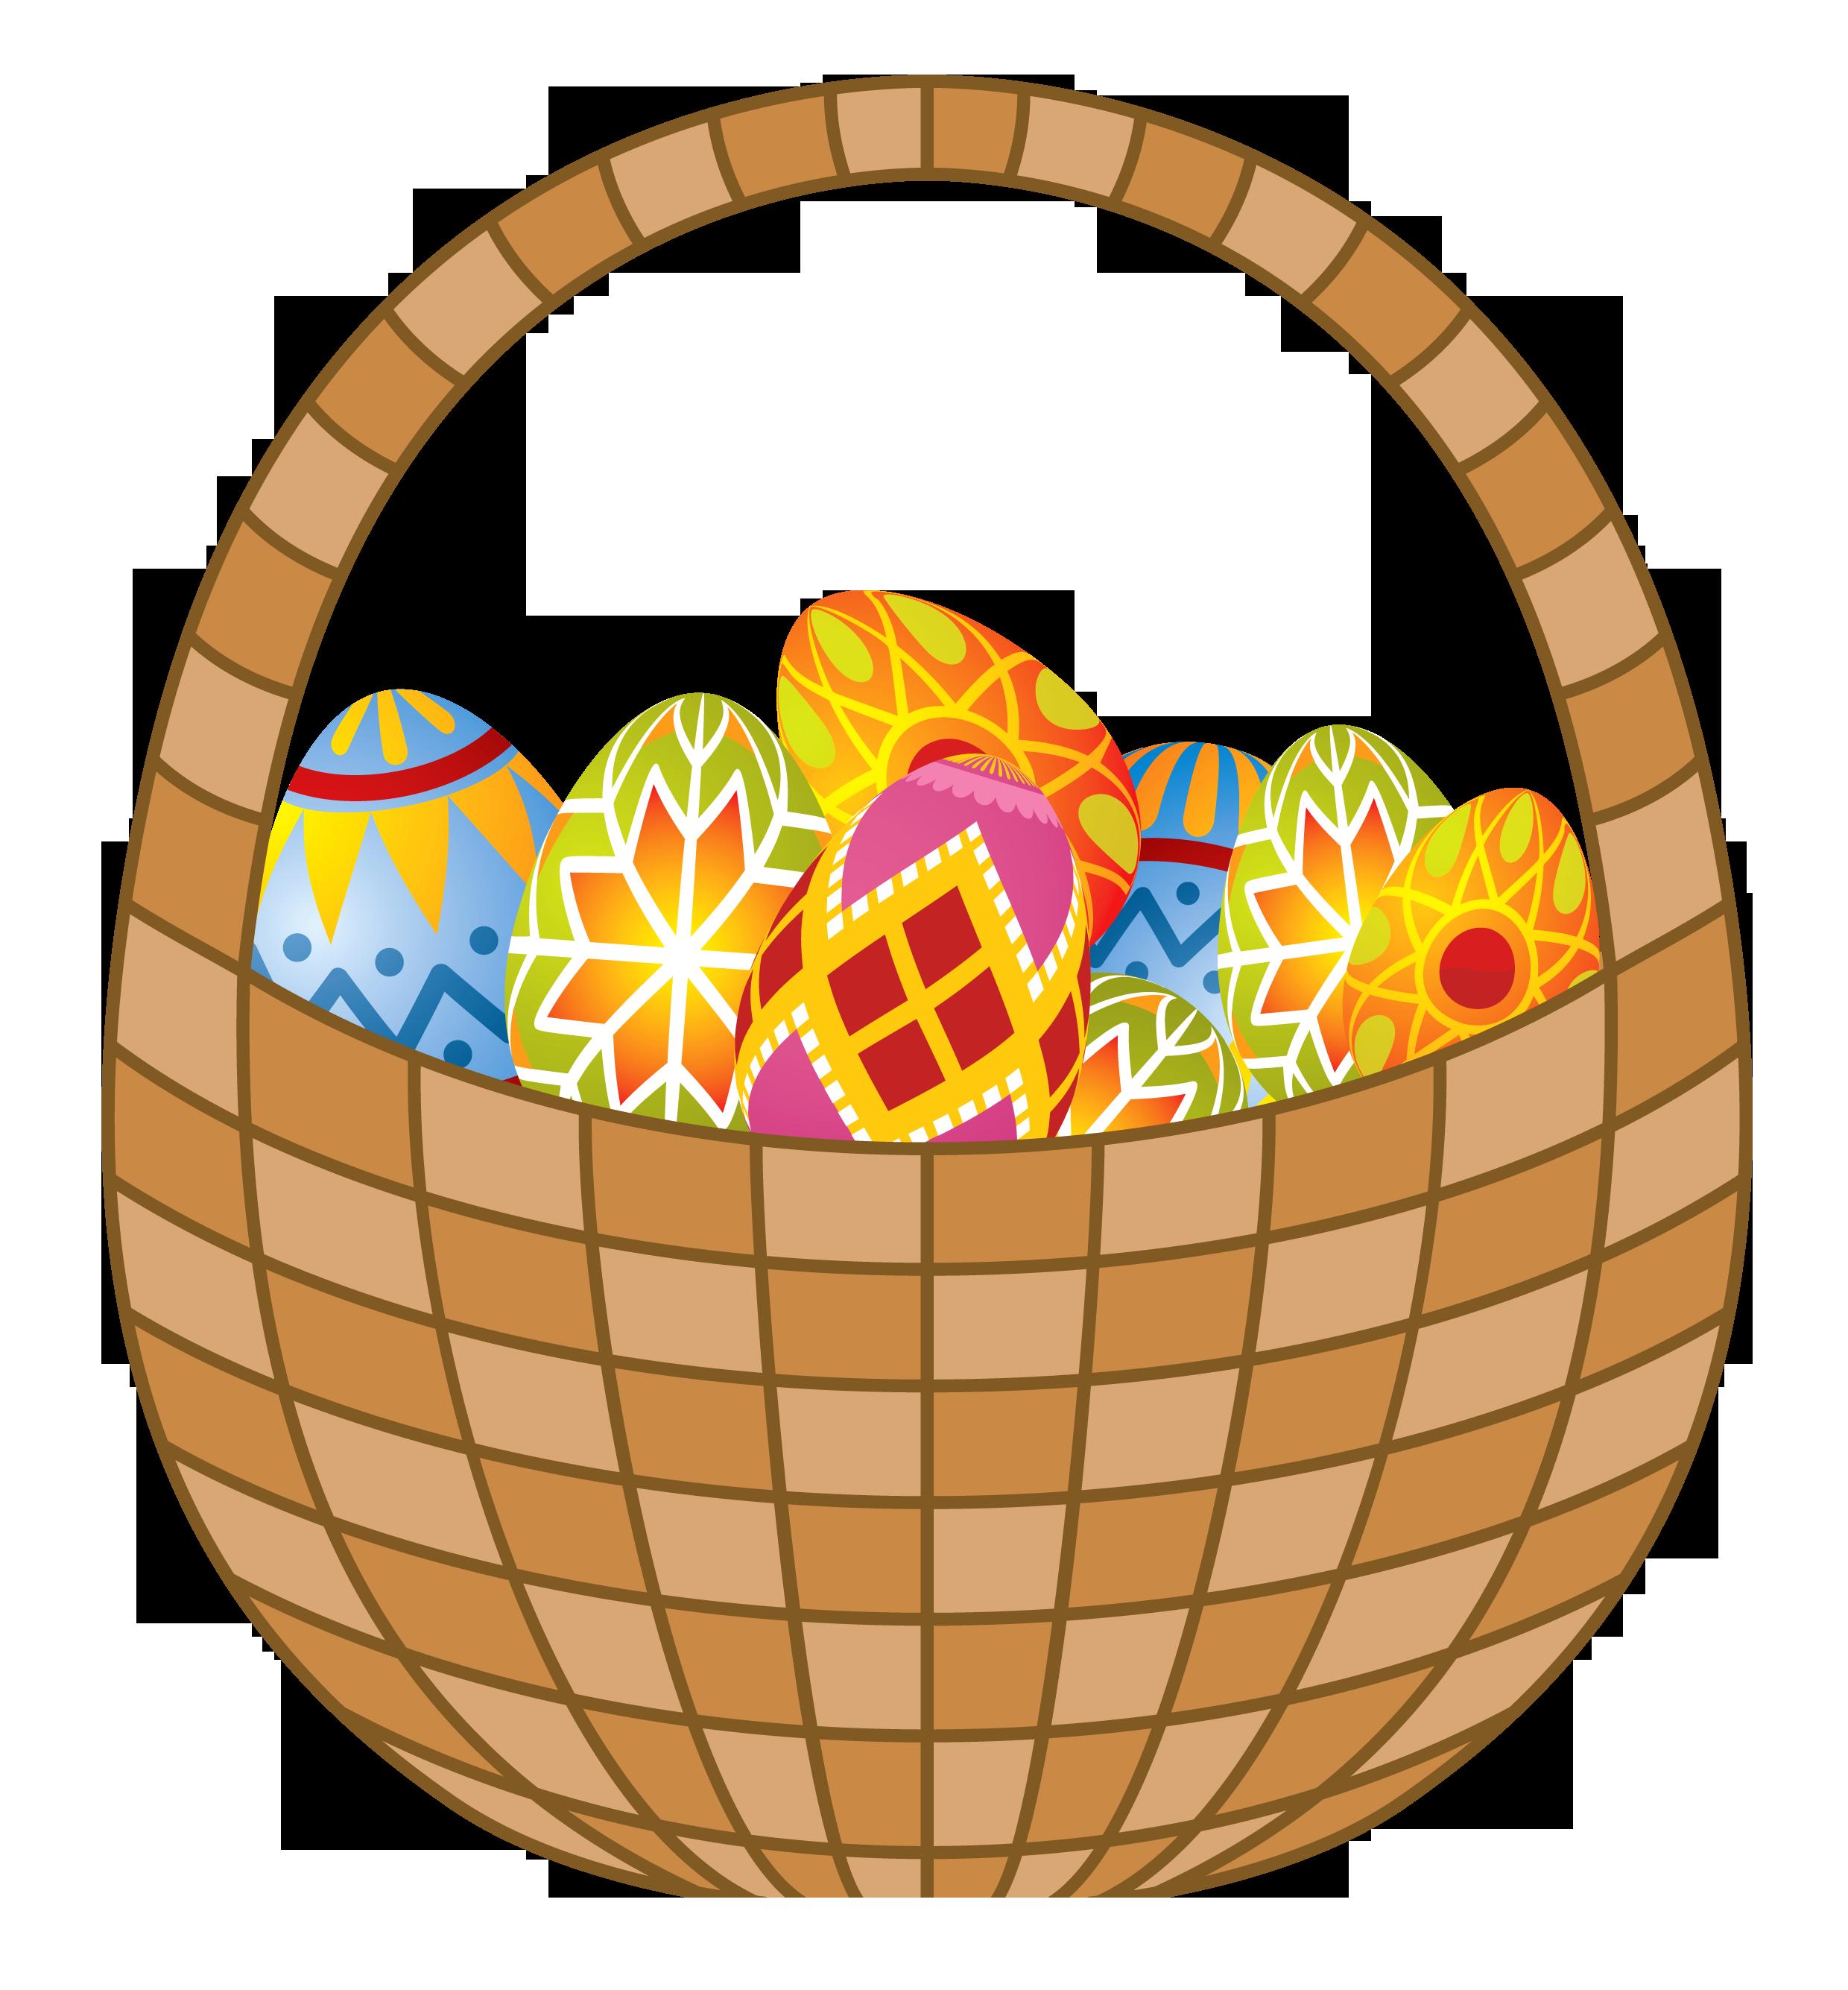 Clipart easter egg basket image library stock Easter Eggs and Basket PNG Clipart image library stock